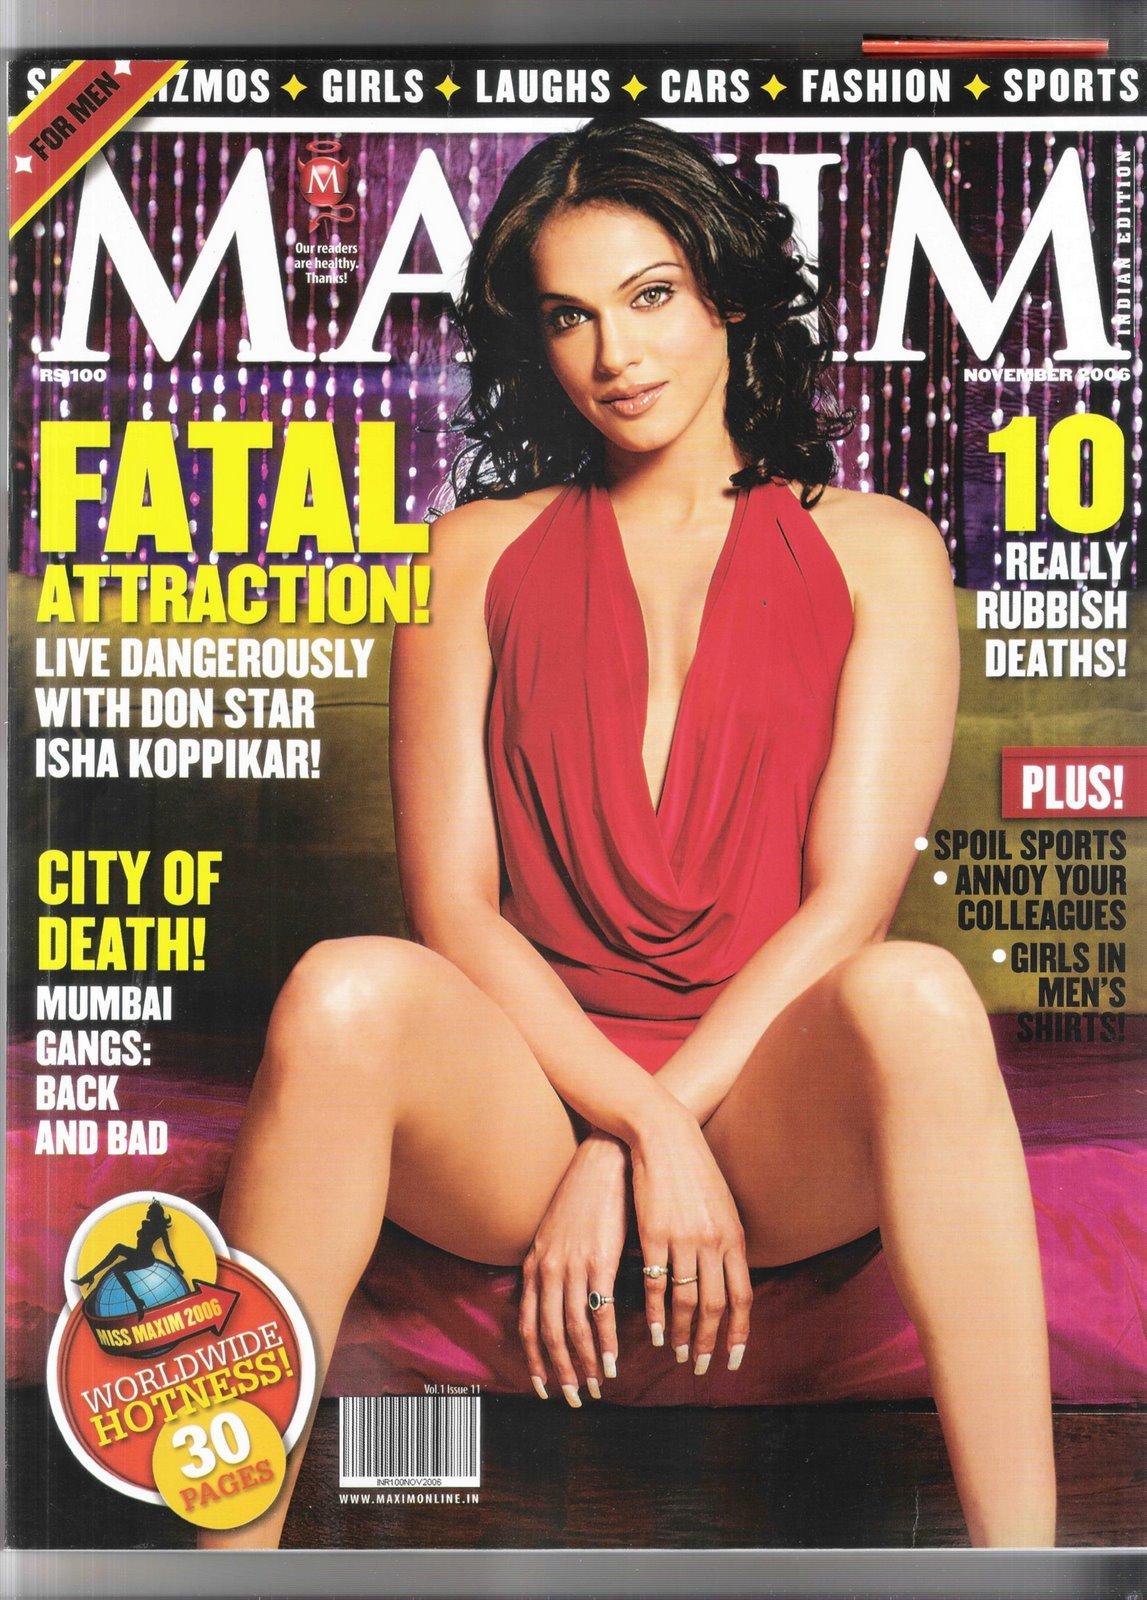 who looks best on Maxim Cover?Katrina Wo